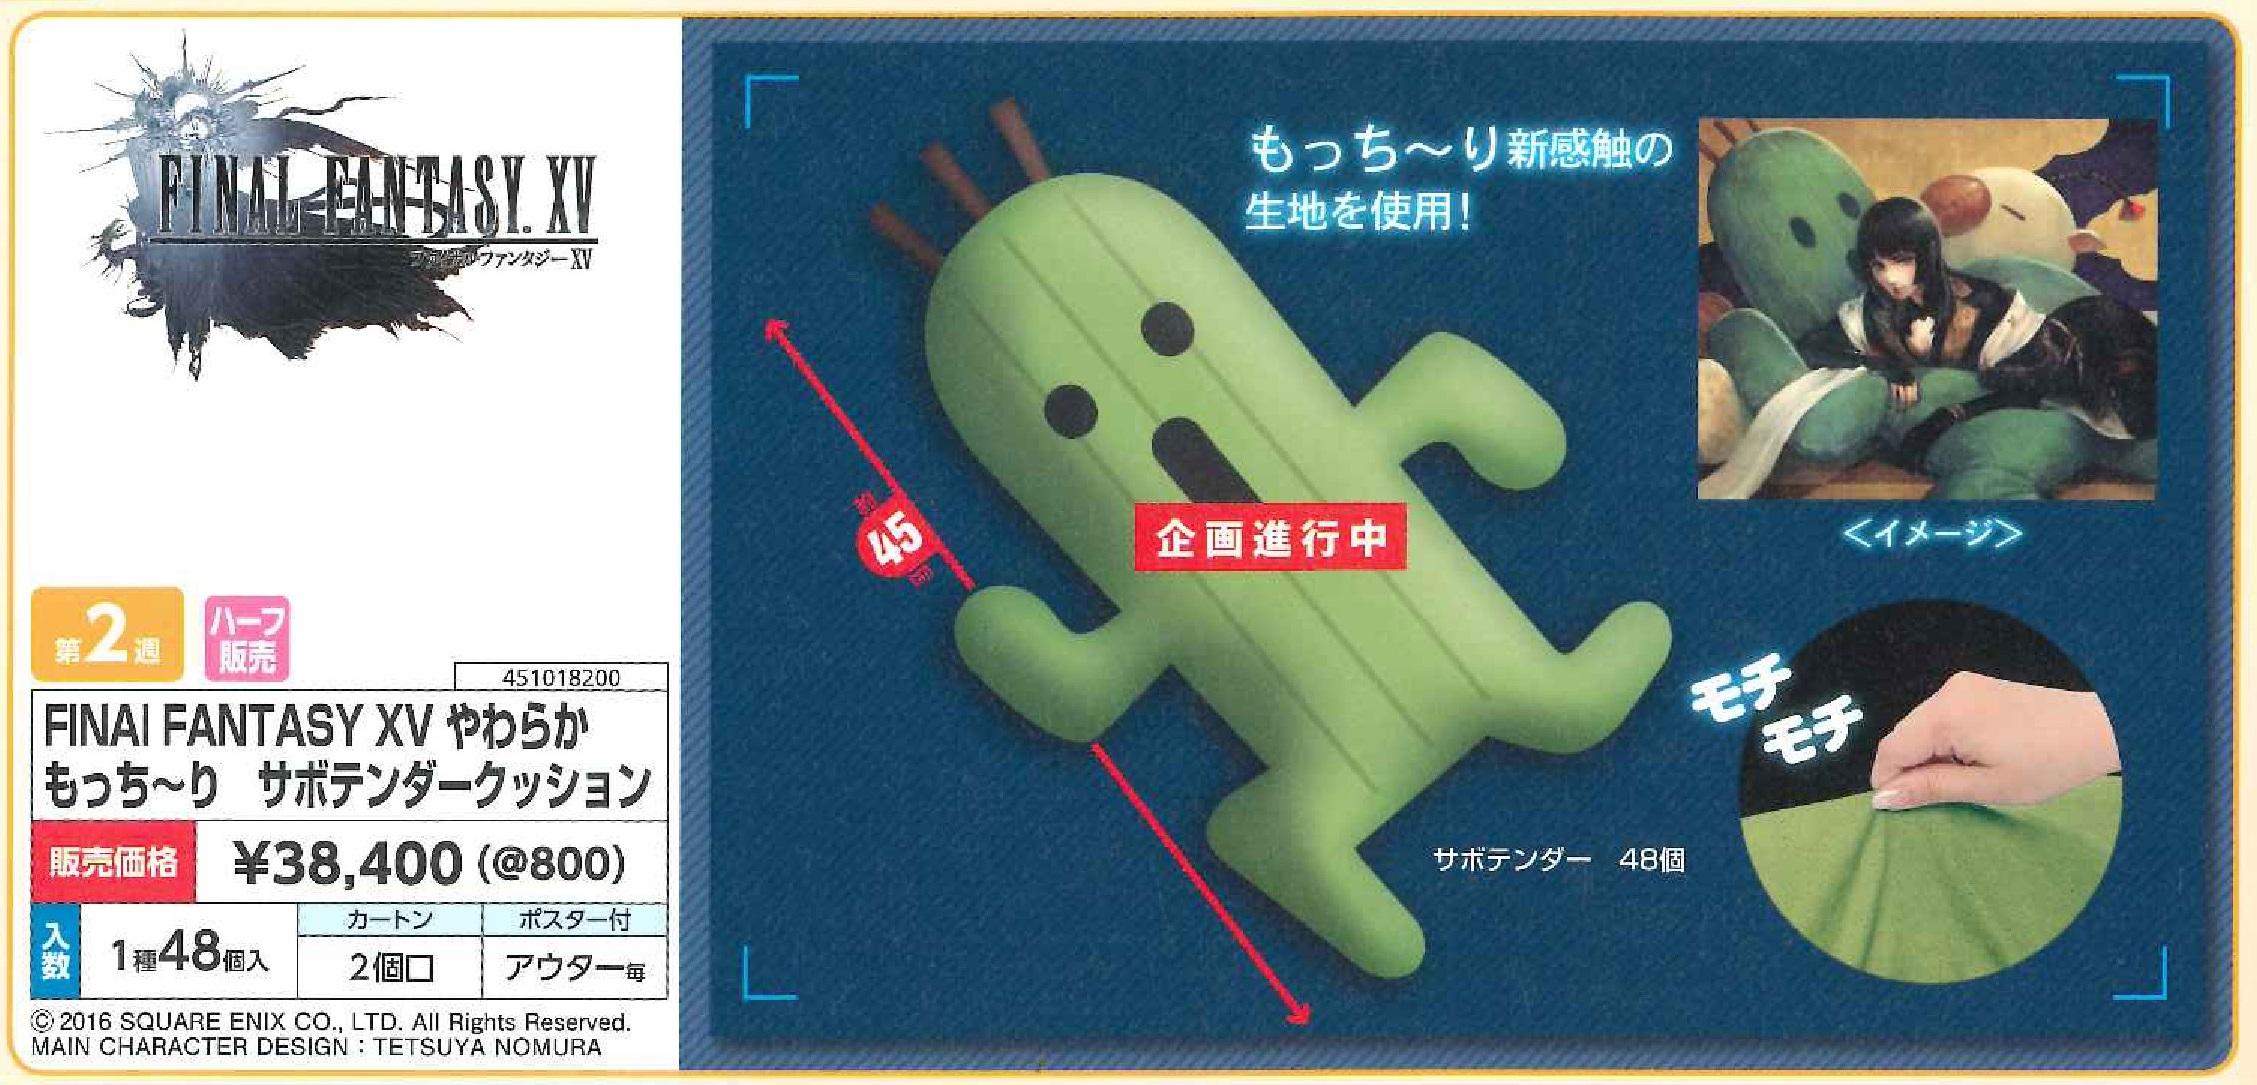 【B】景品 最终幻想15 软软仙人掌抱枕 全1种(1套2箱48个)018200